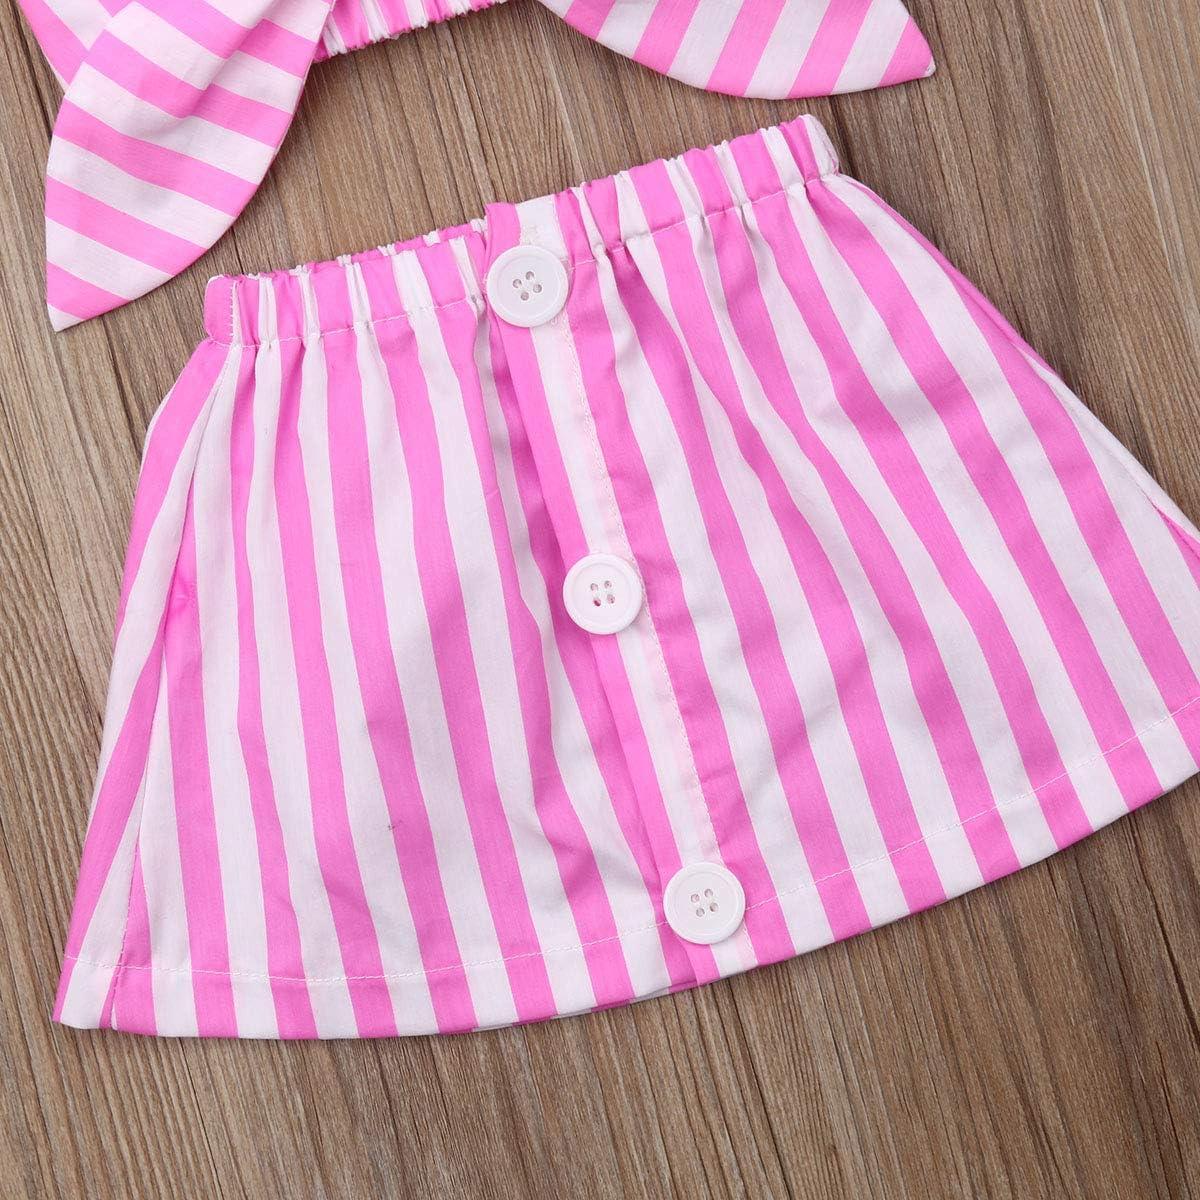 Infant Kid Baby Girls Sleeveless Halter Crop Top Vest T-Shirt Button Striped A-Line Skirt Headband Outfits